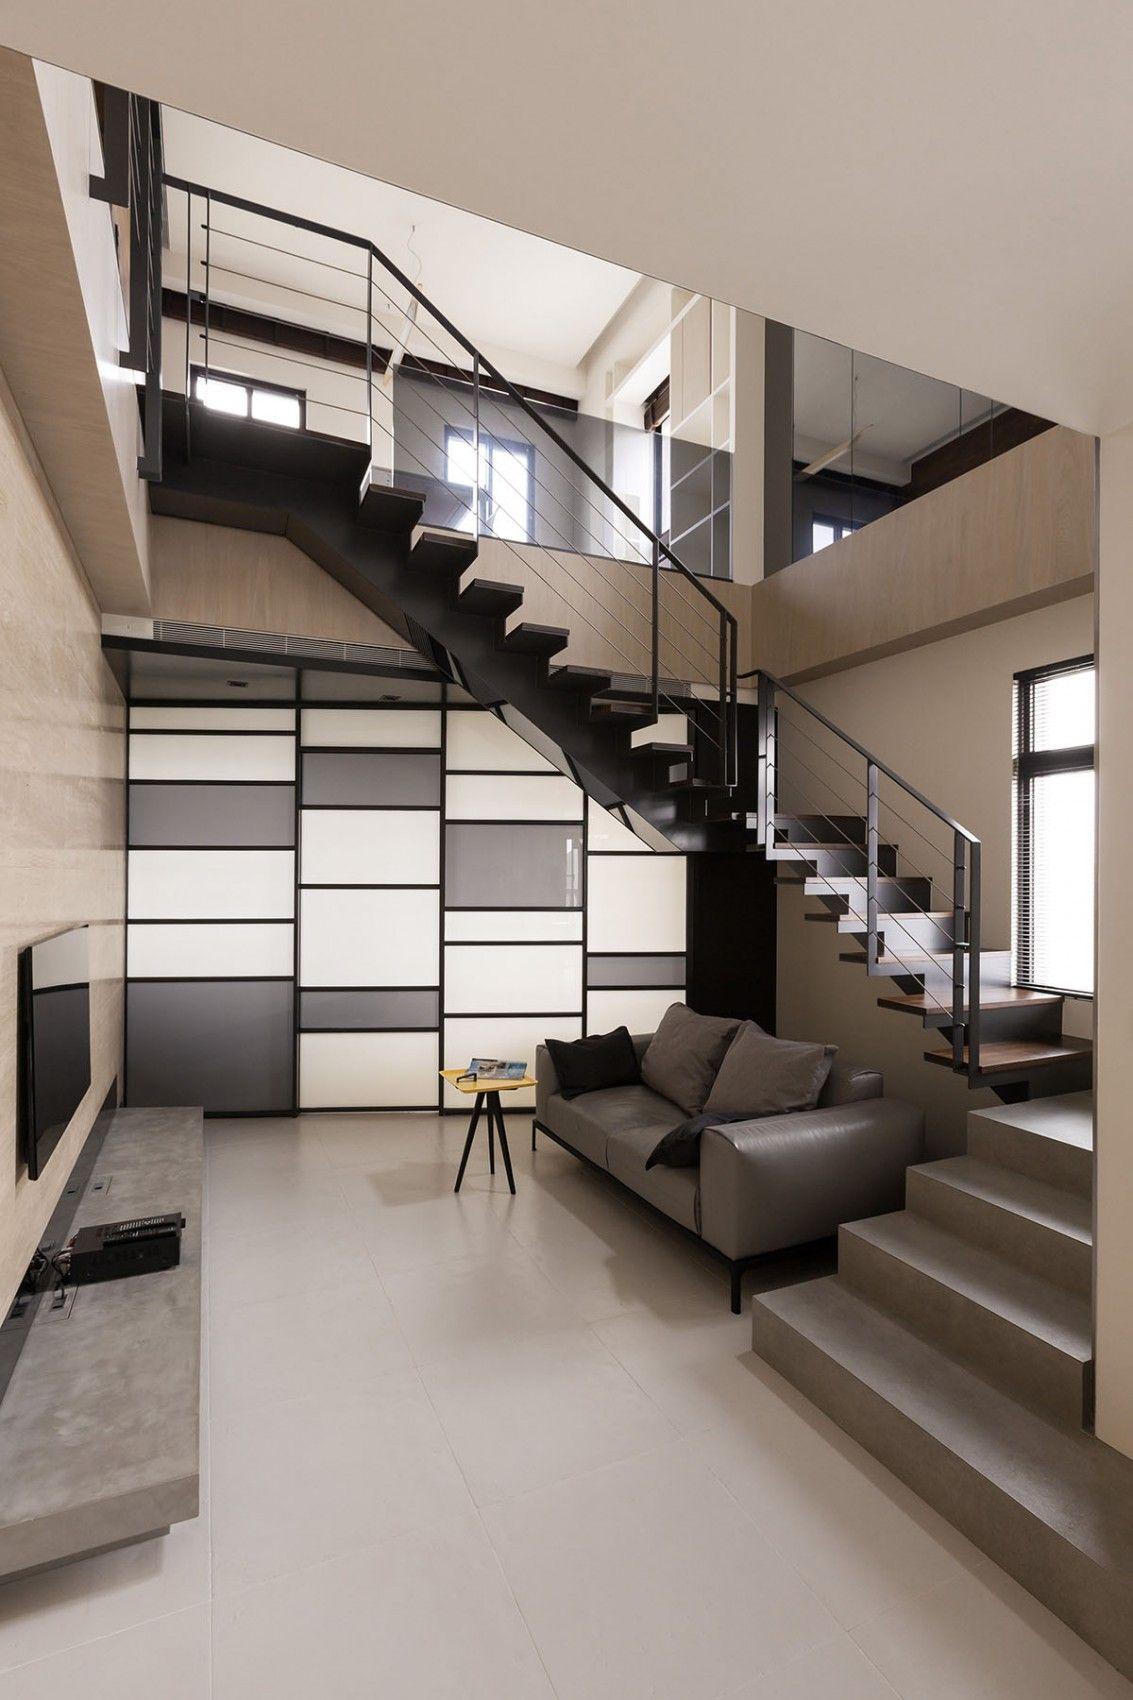 Lo Residence by LGCA DESIGN | Interior design studio, Interiors ...